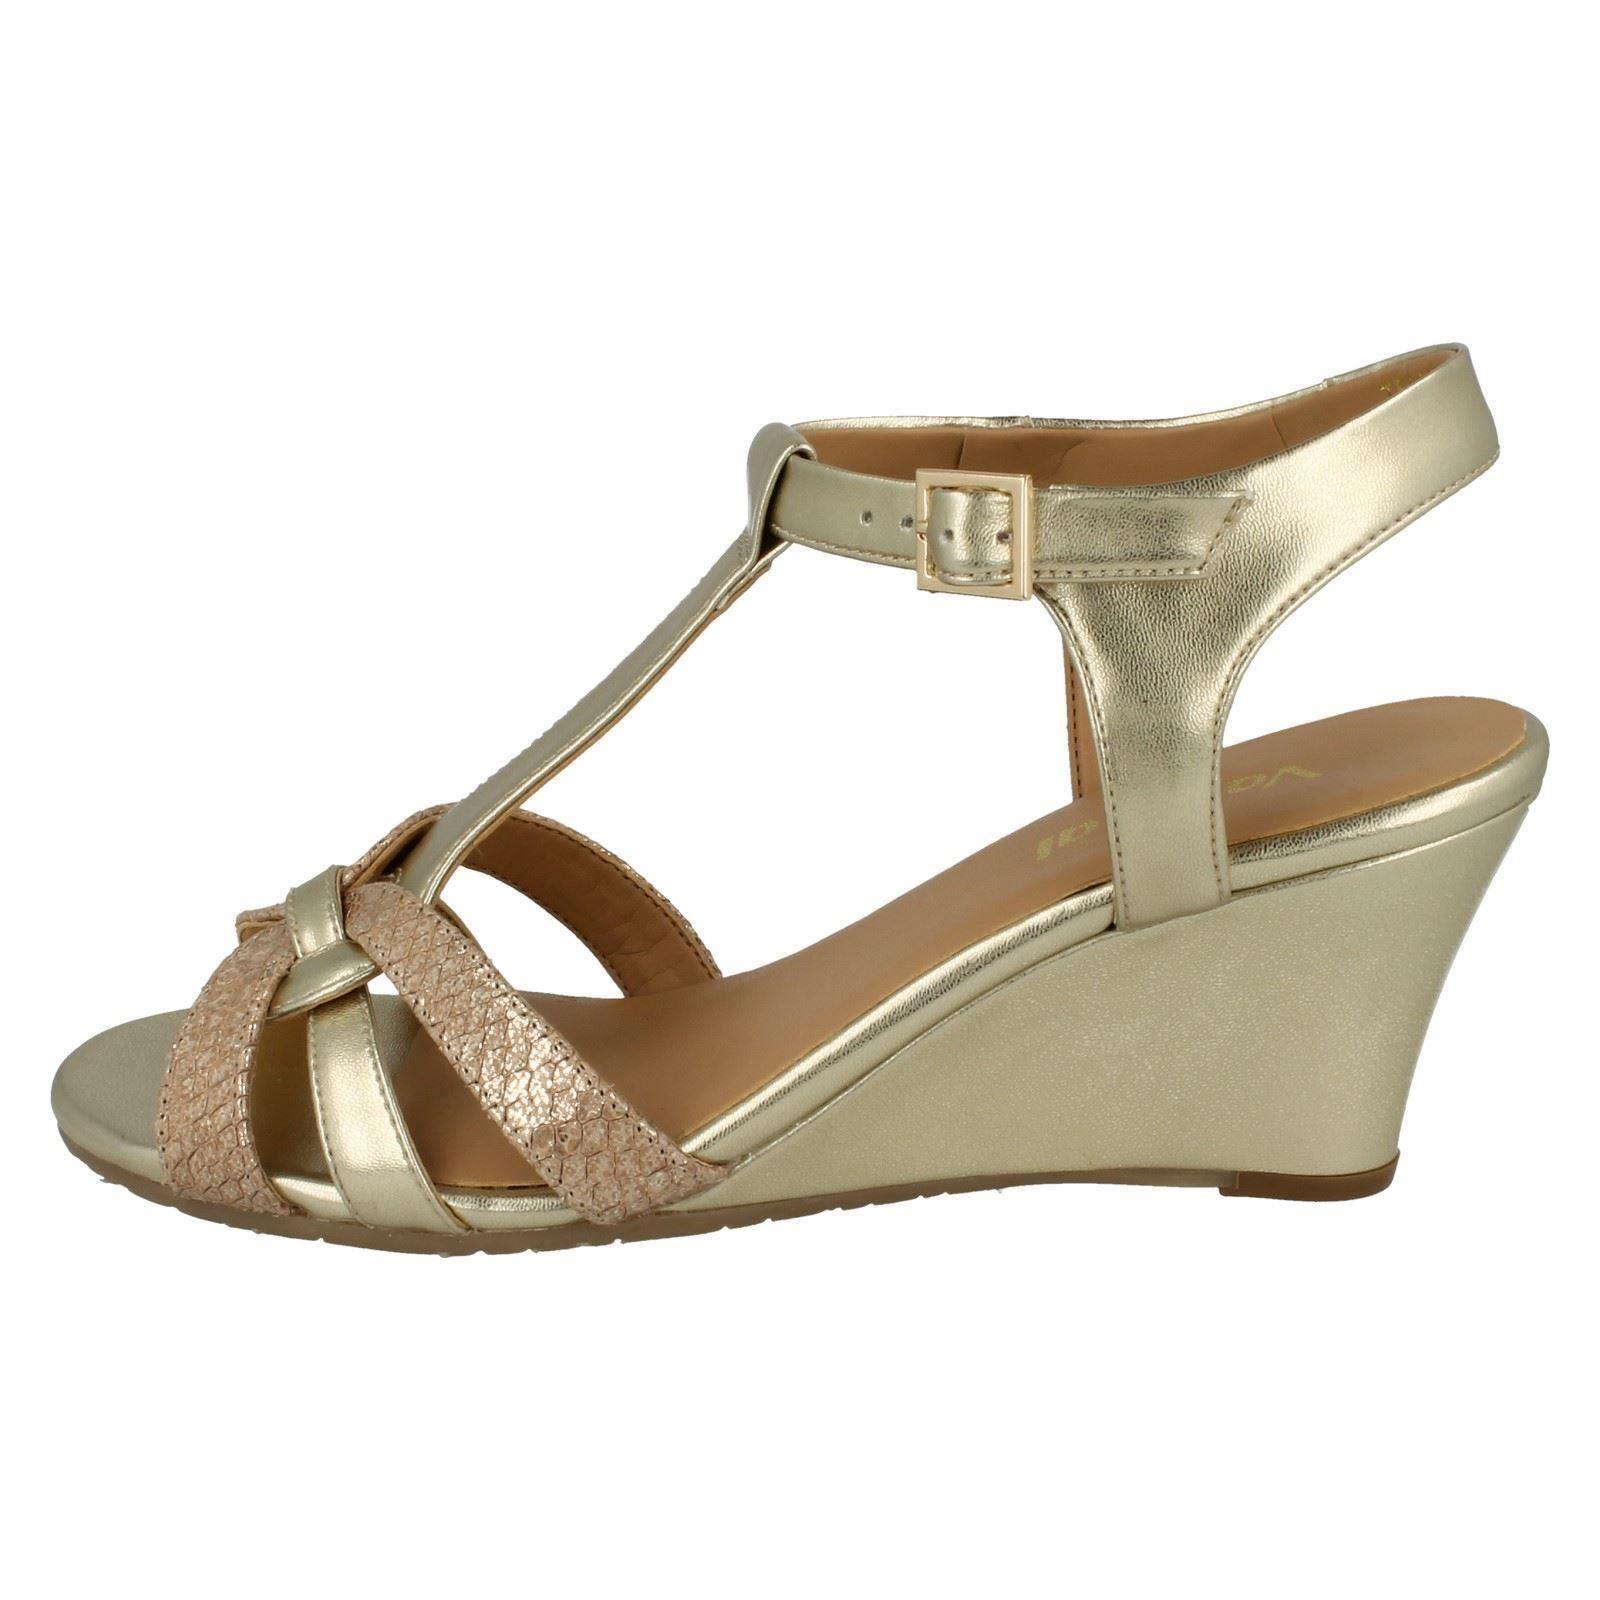 8dbfca7922fb Ladies Van Dal T-Bar Wedge Sandals Temple